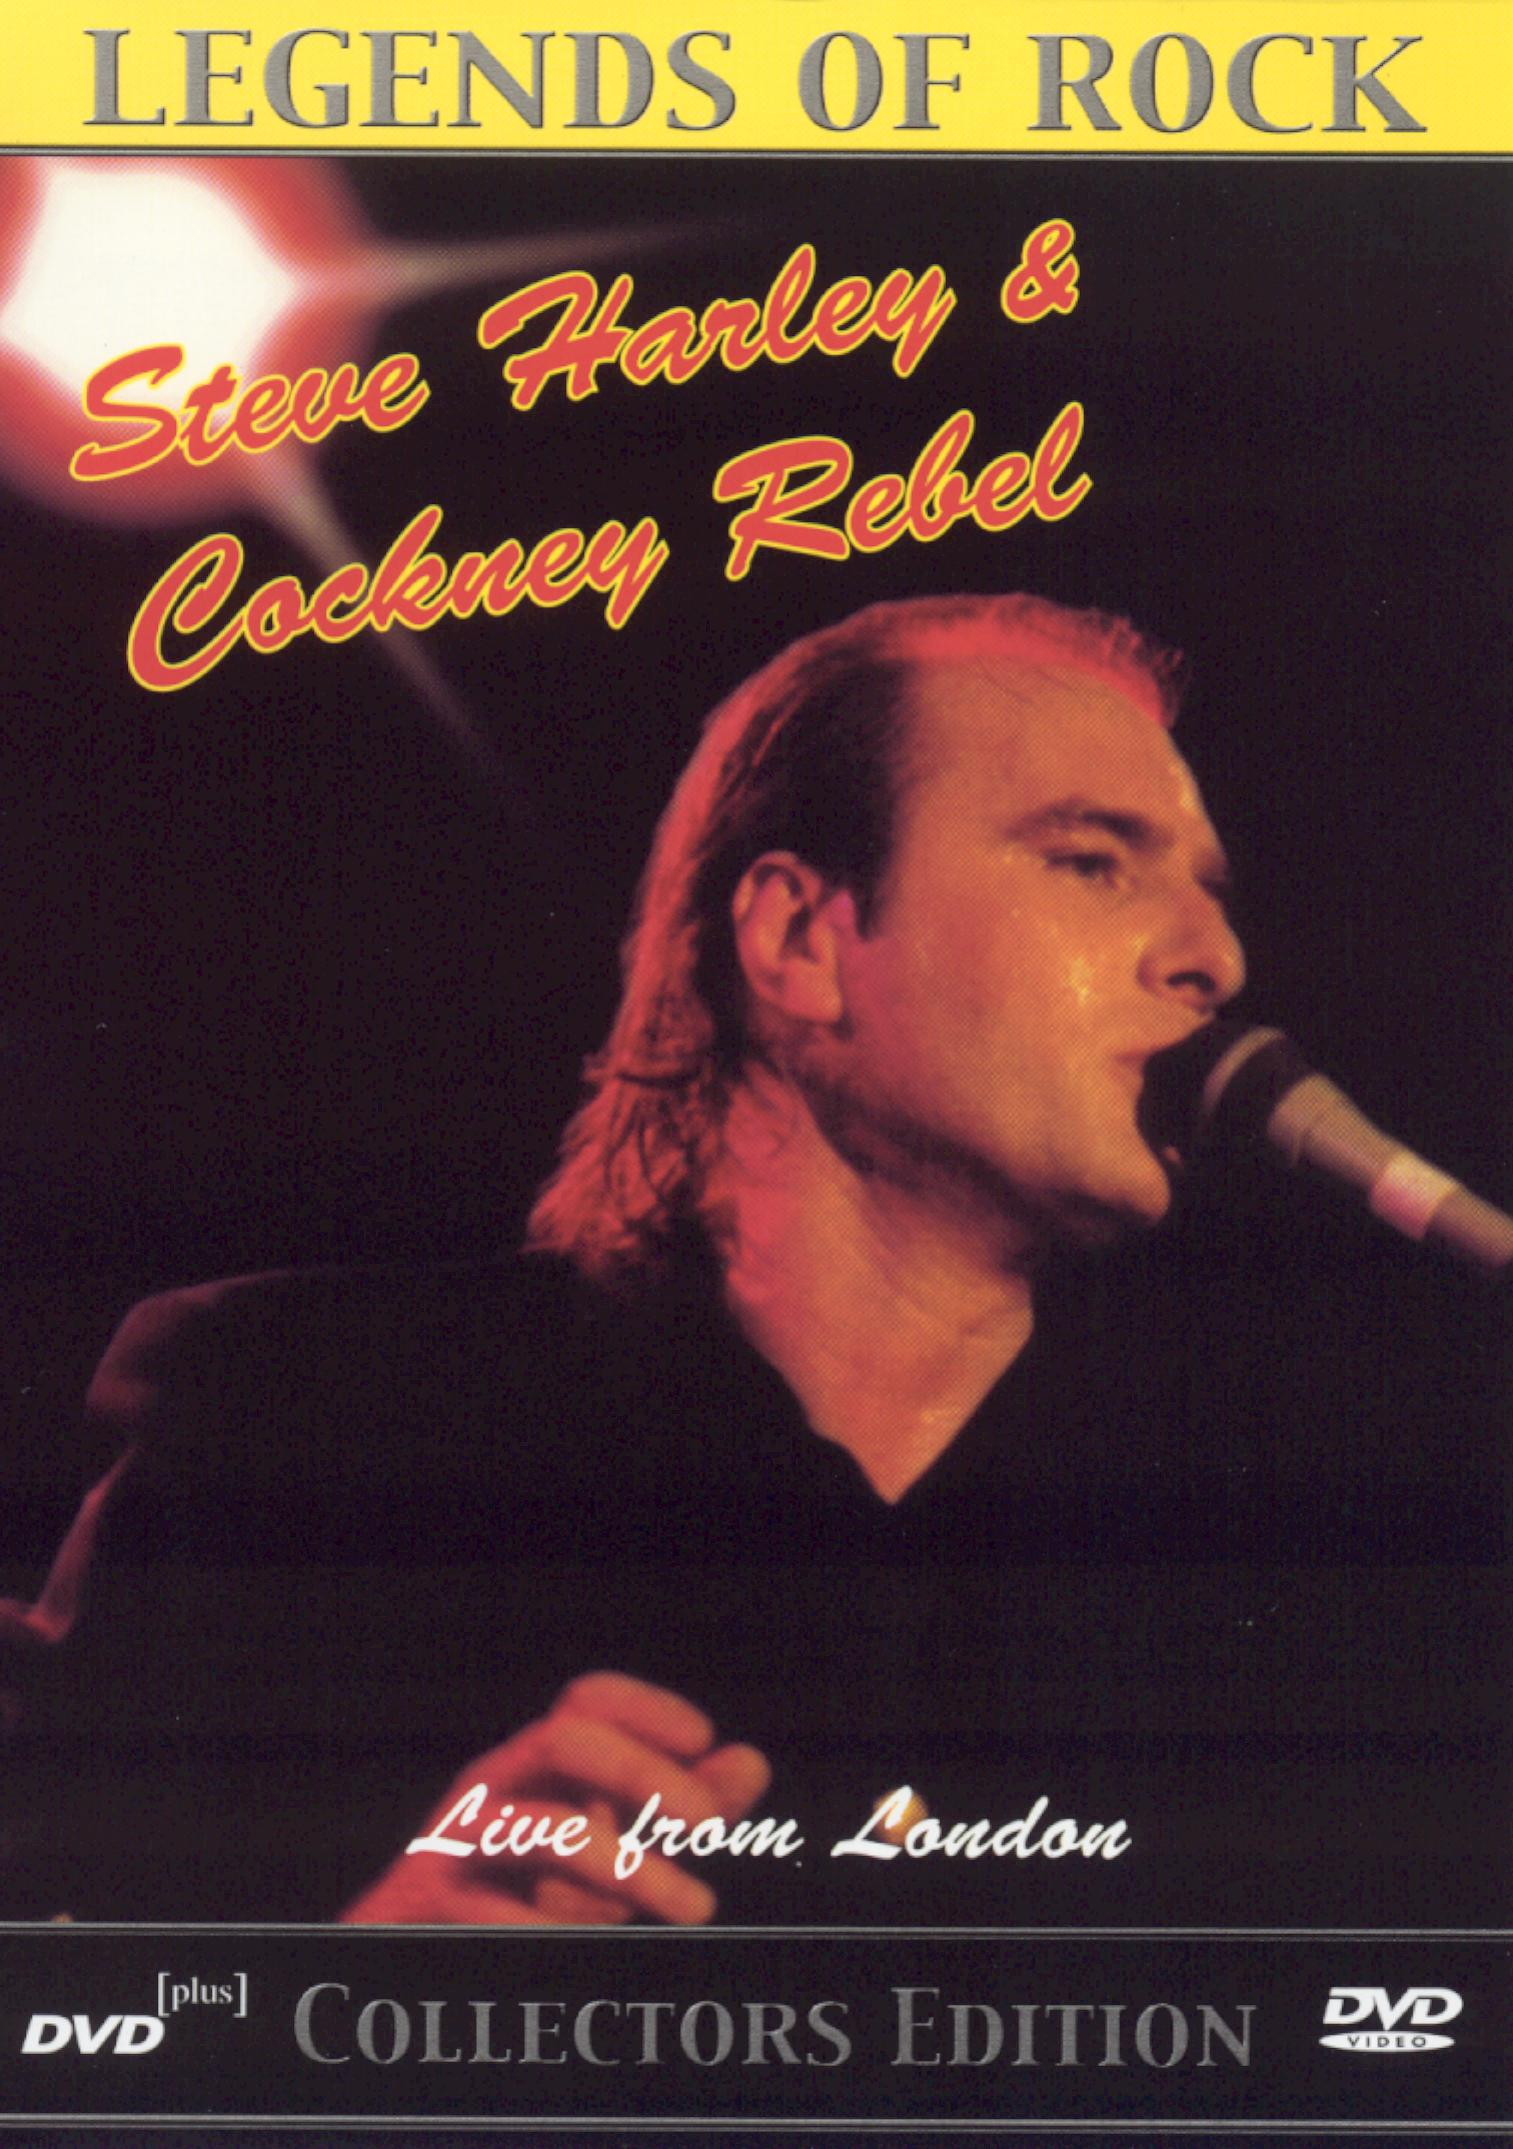 Steve Harley & Cockney Rebel: Live from London